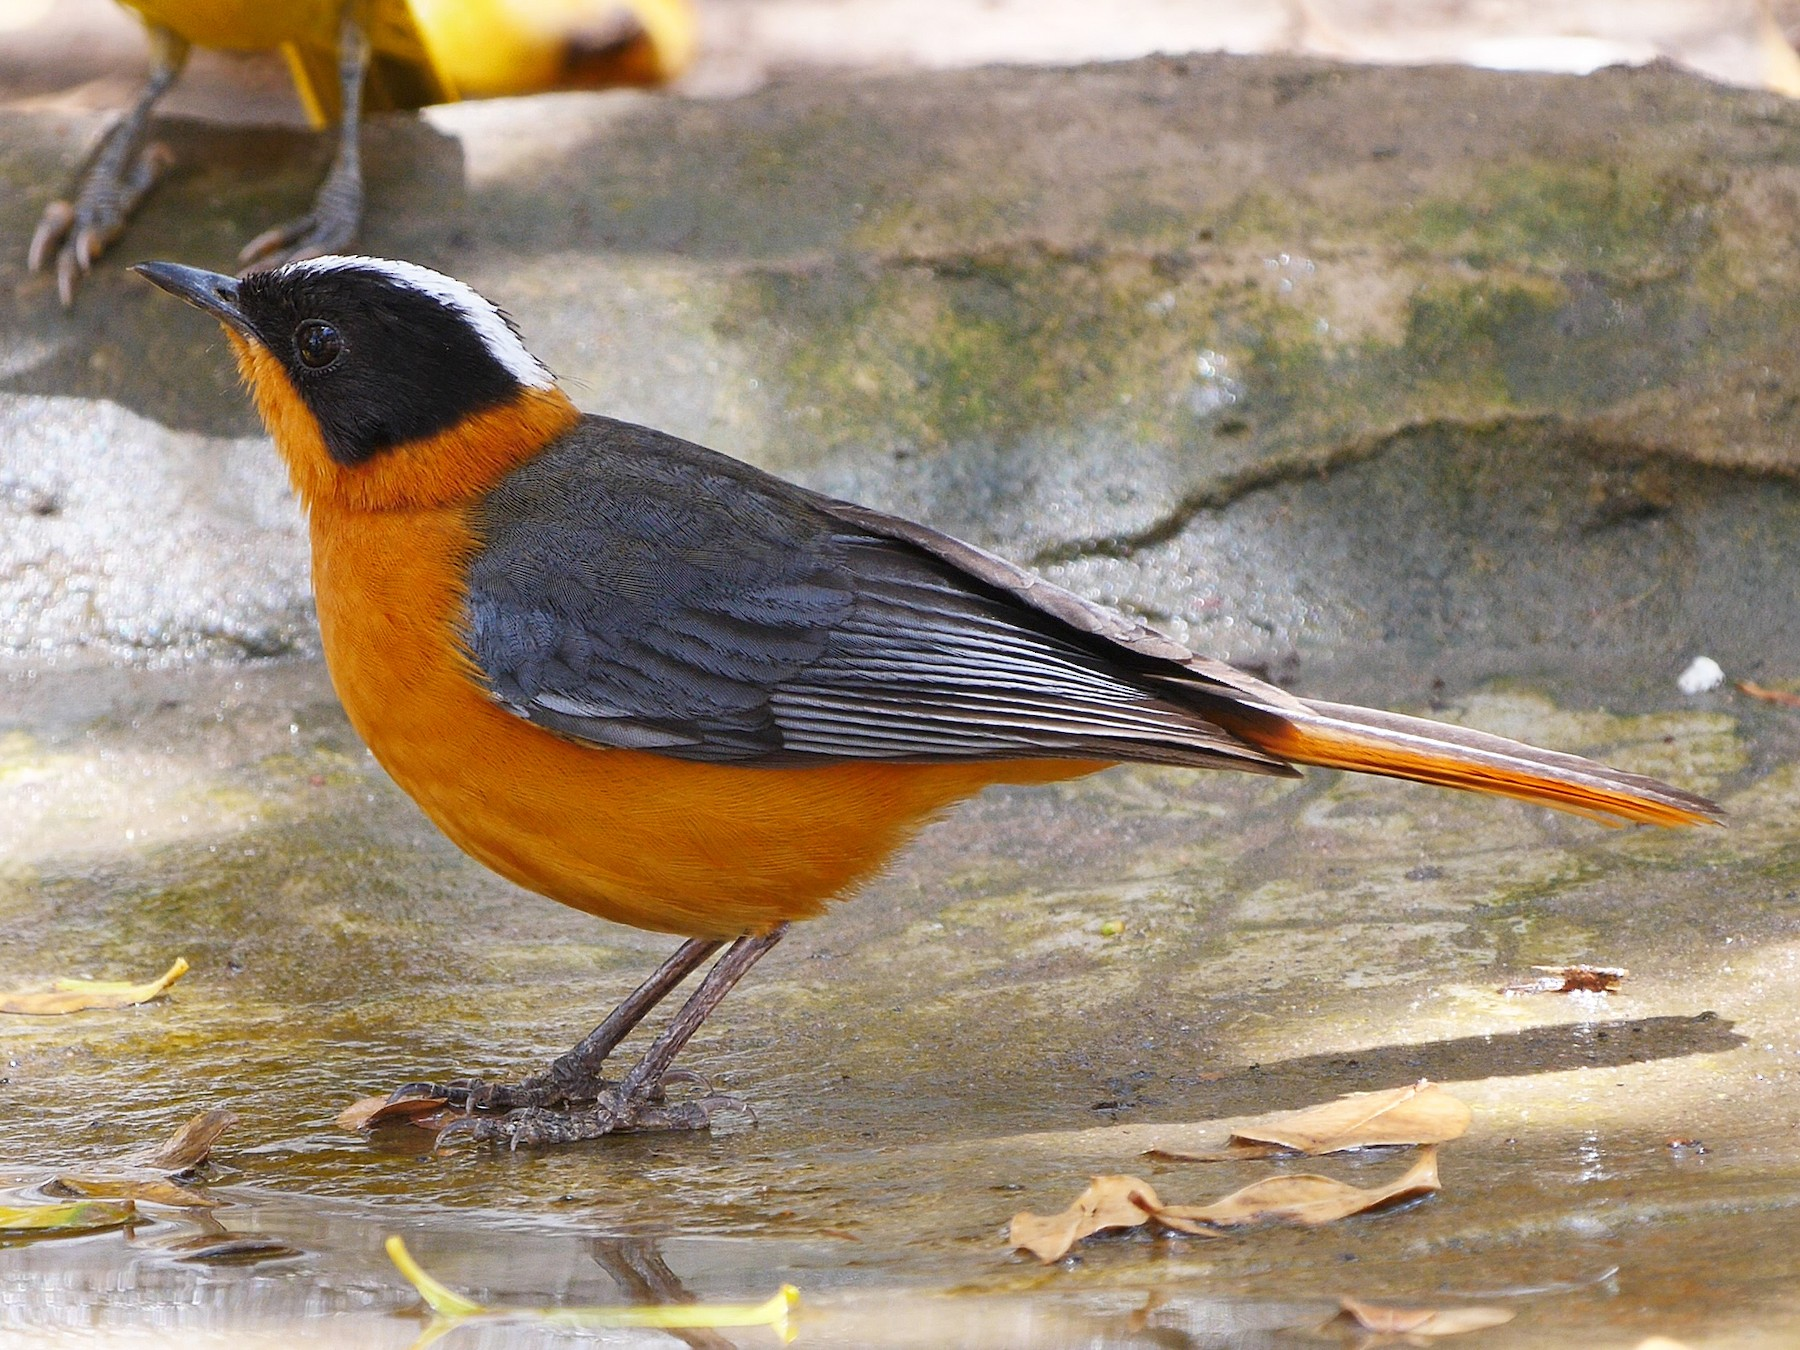 Snowy-crowned Robin-Chat - Josep del Hoyo